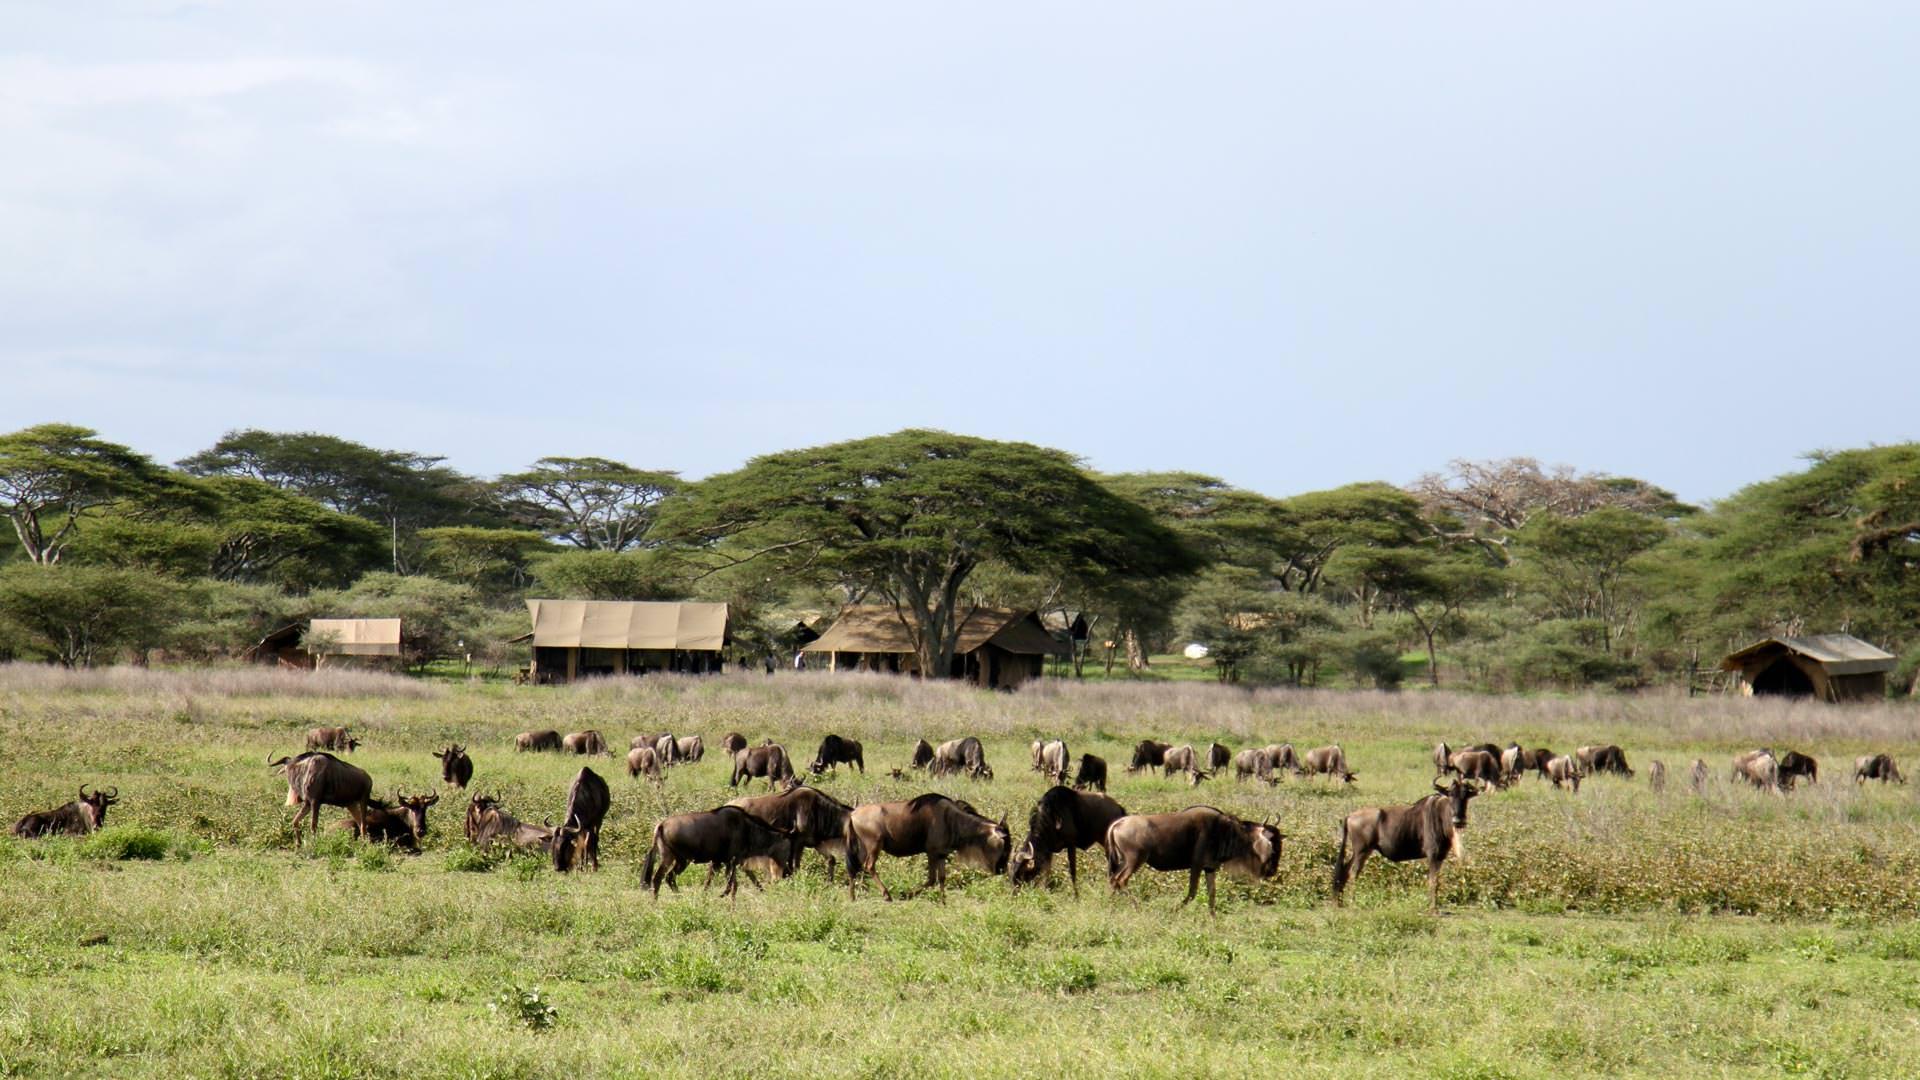 Wildebeest in front of camp